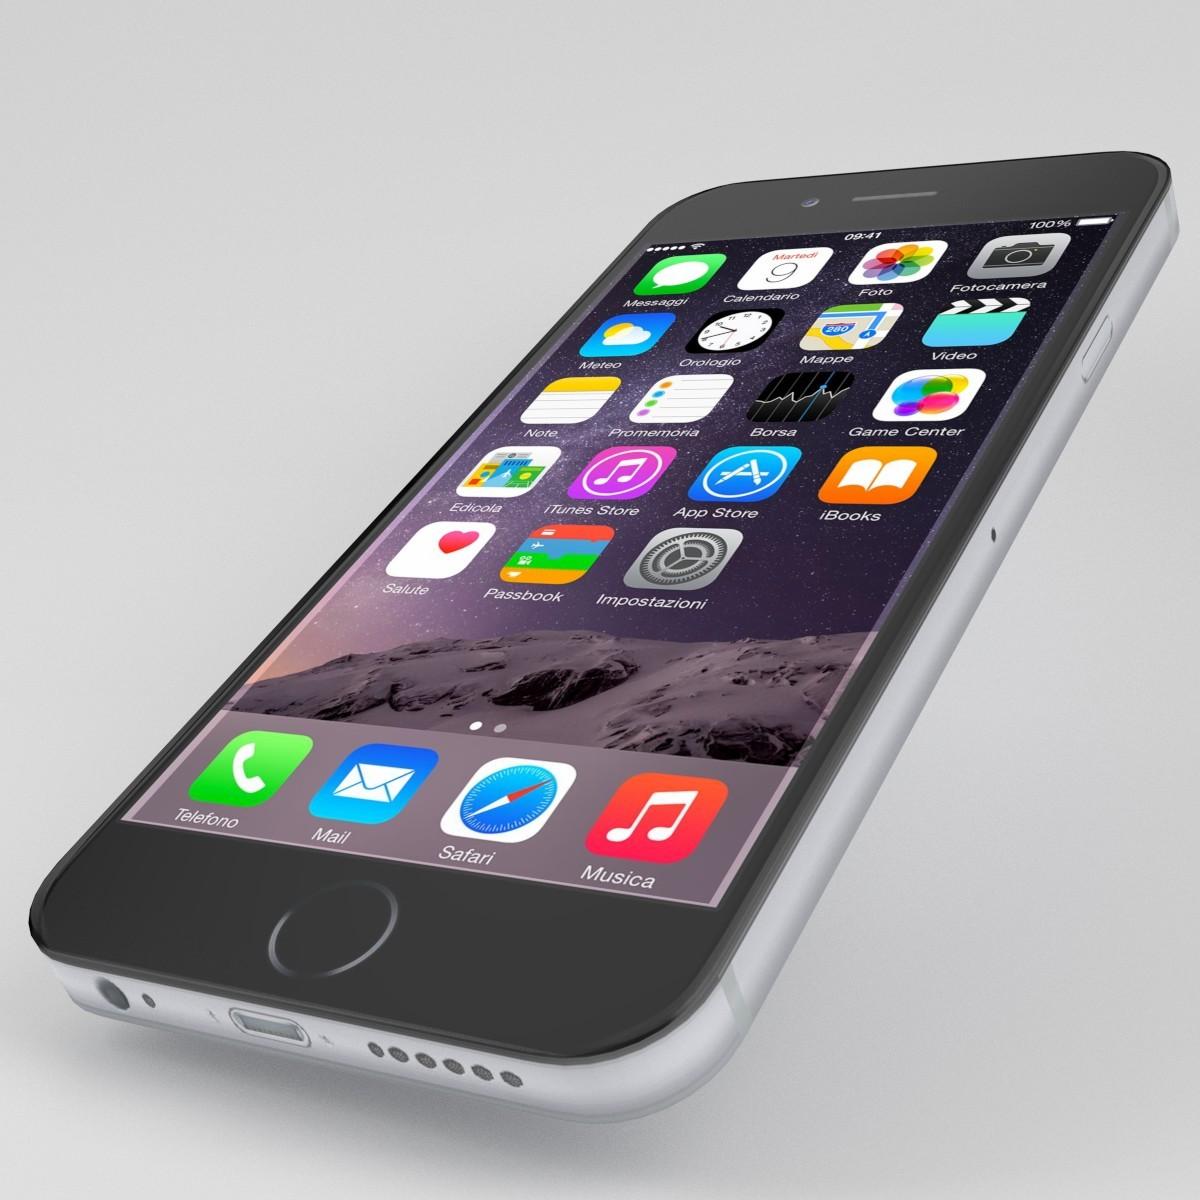 iPhone-6-Black---Screen-00.jpg